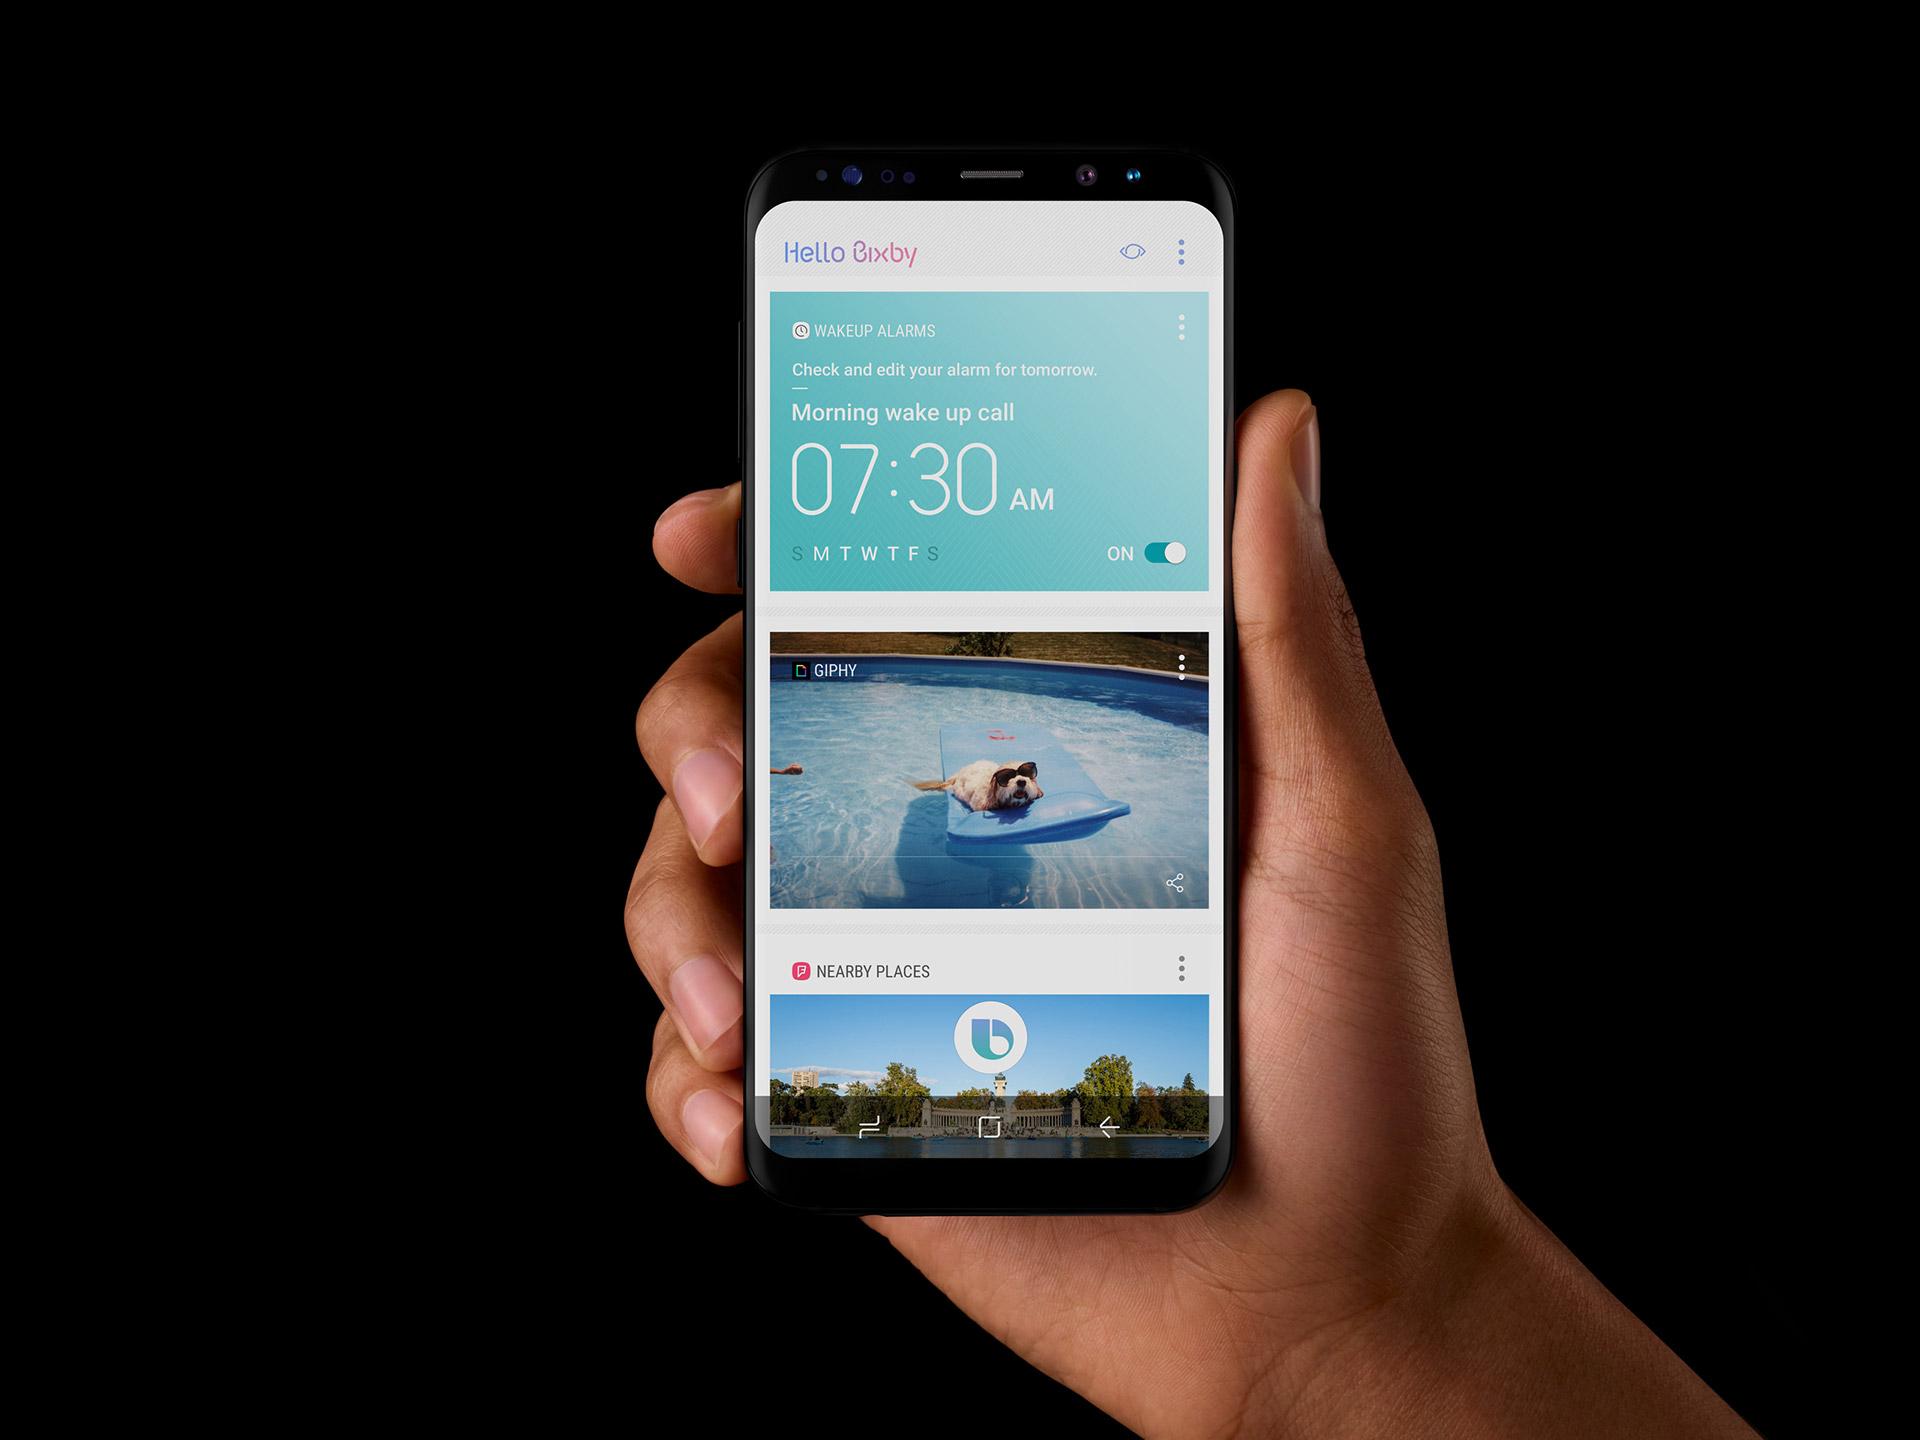 Samsung_Galaxy_S8_Stills_Bixby_Hello.jpg